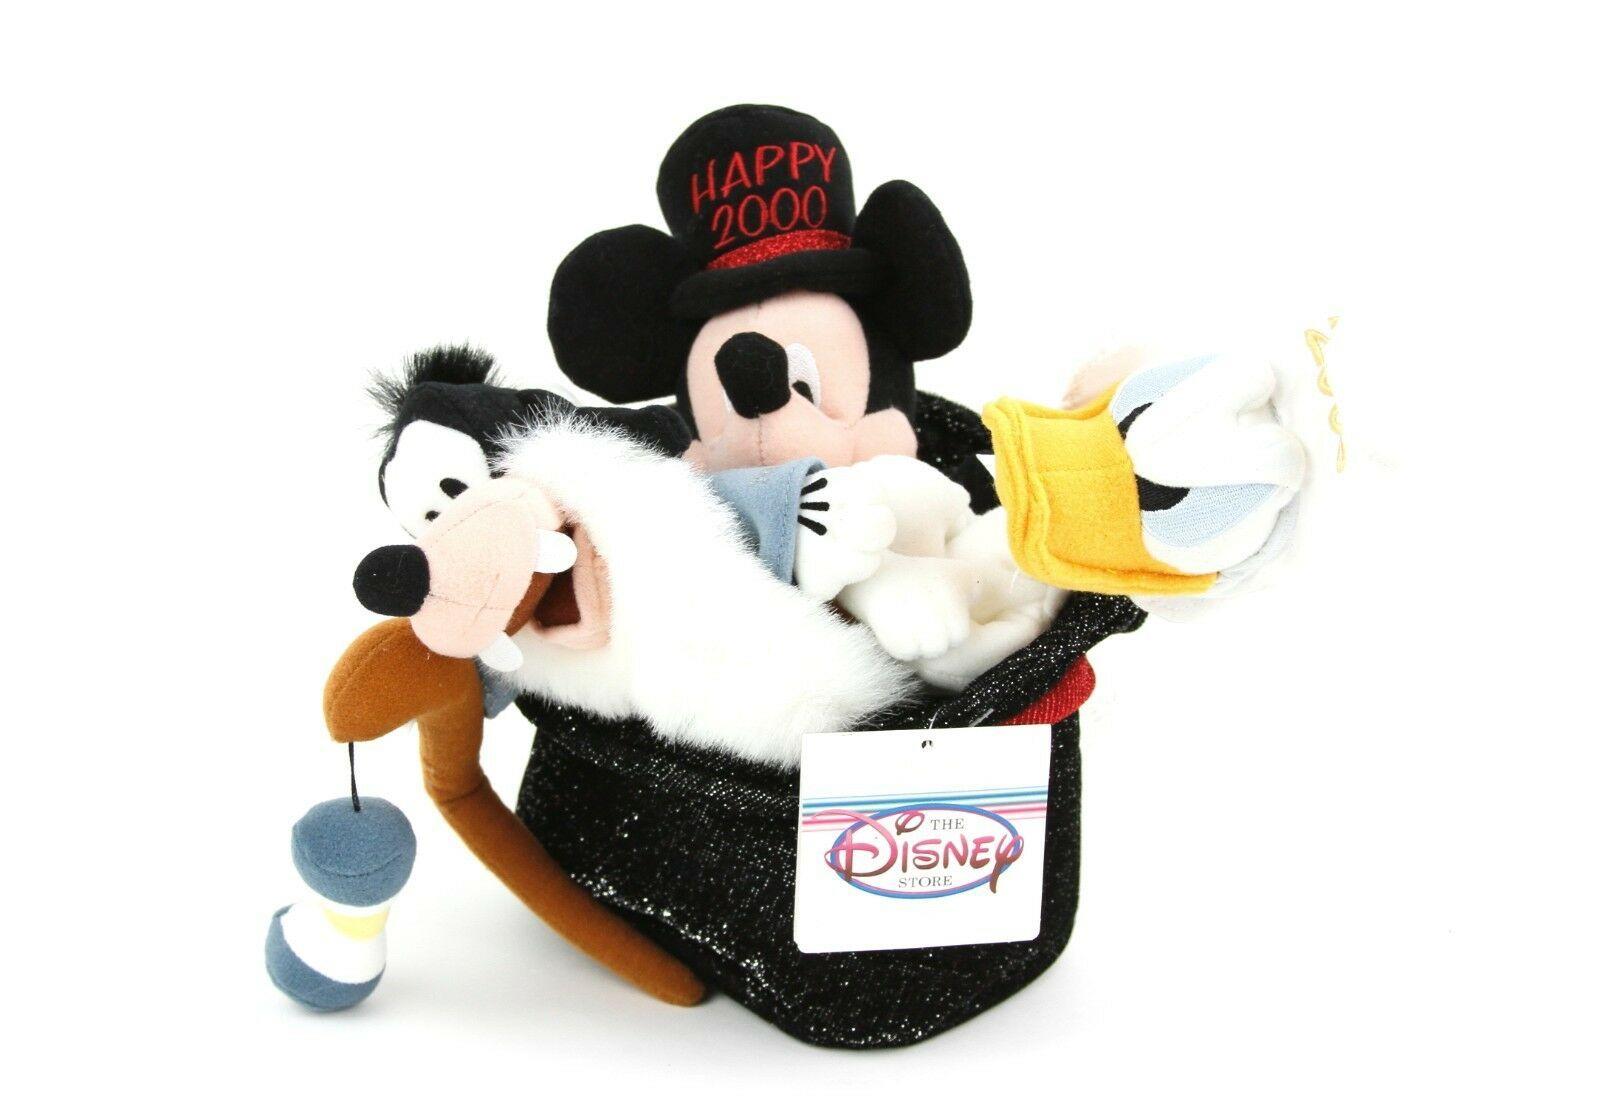 Disney Store 2000 Millennium Bean Bag Set Mickey Mouse Donald Duck Goofy In Hat - $23.33